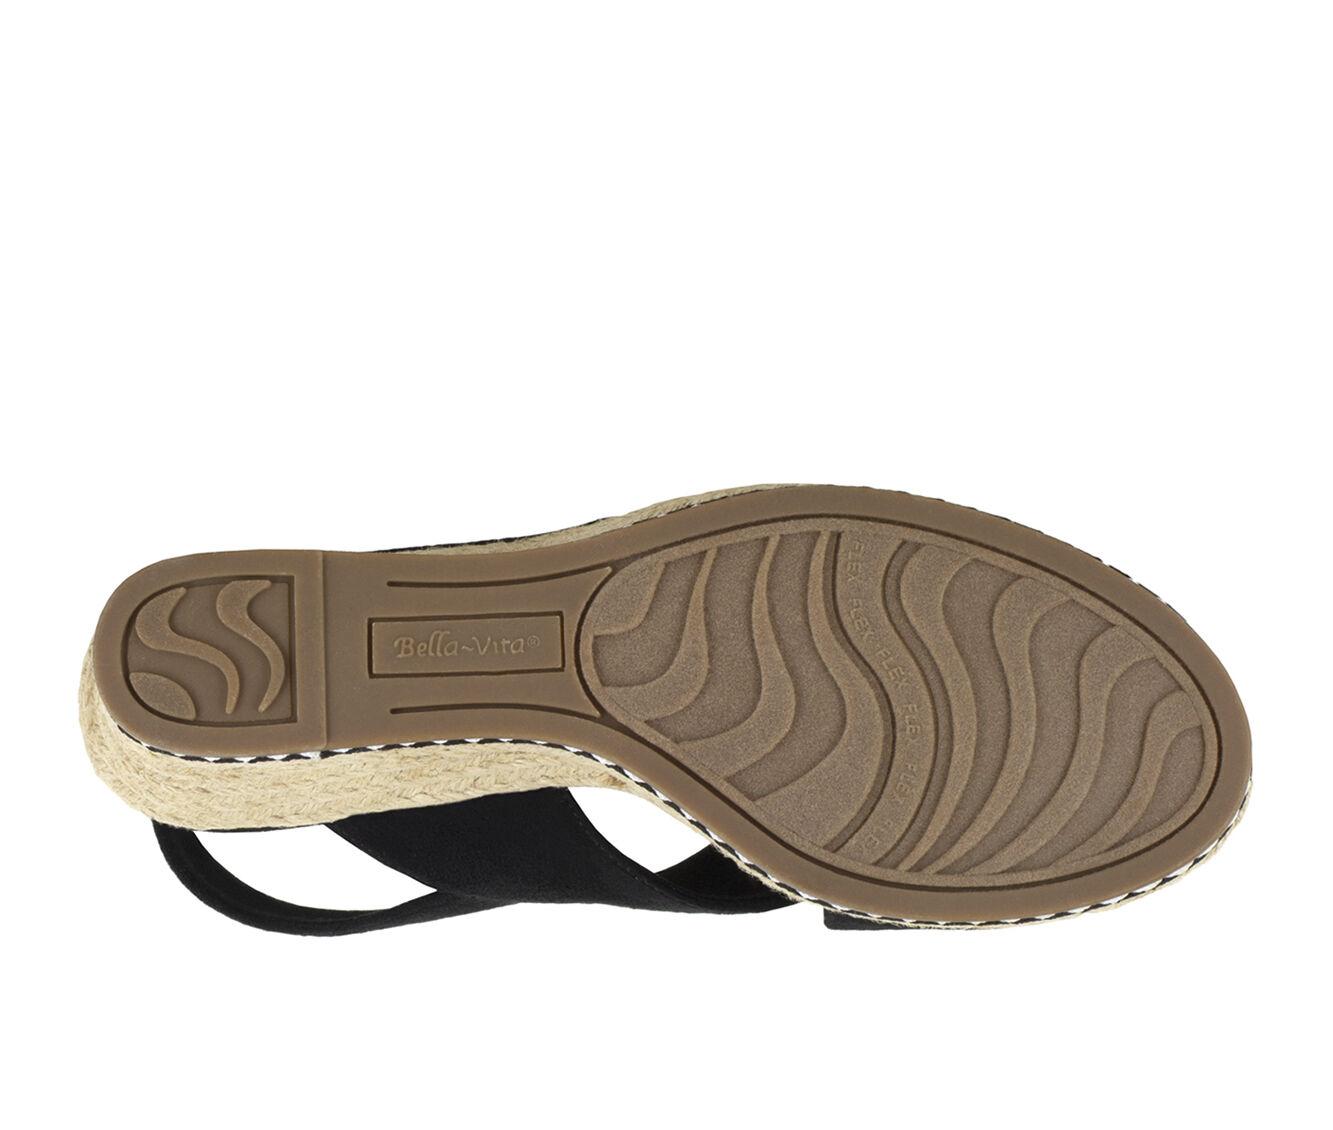 Women's Bella Vita Nadette II Wedges | Women's shoes | 2020 New 4EQcZ